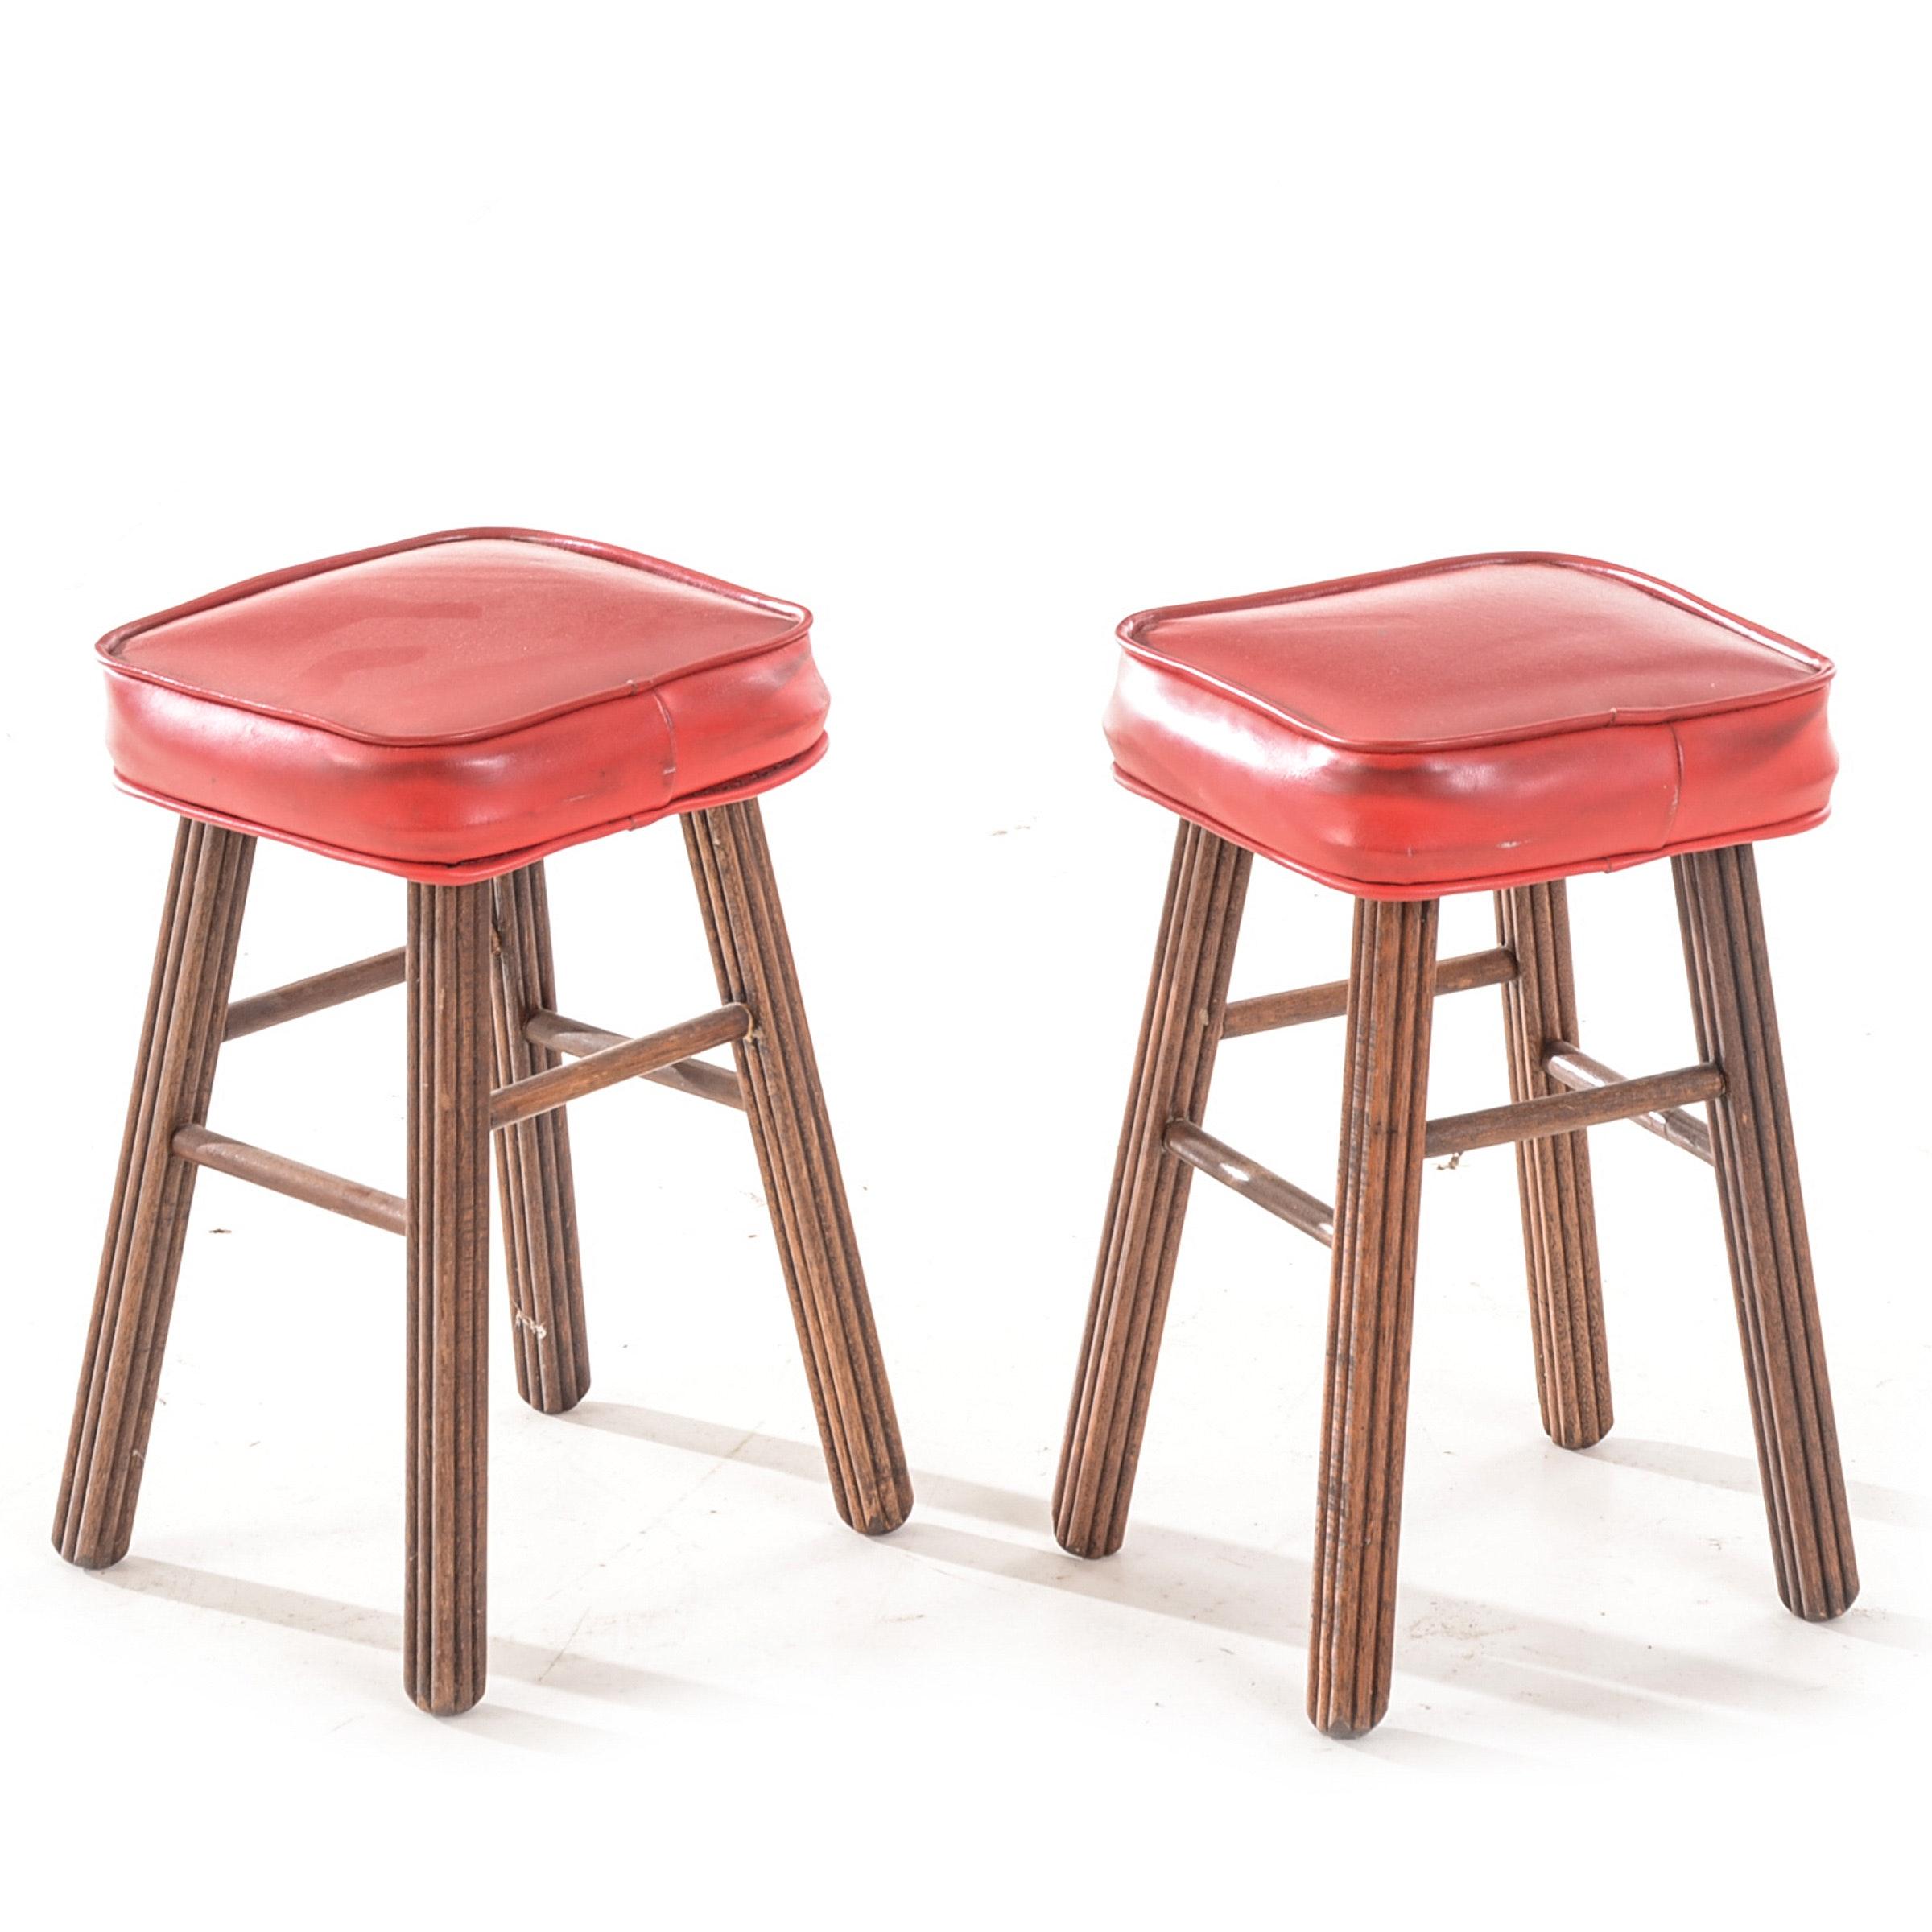 Pair of Red Vinyl Seat Stools